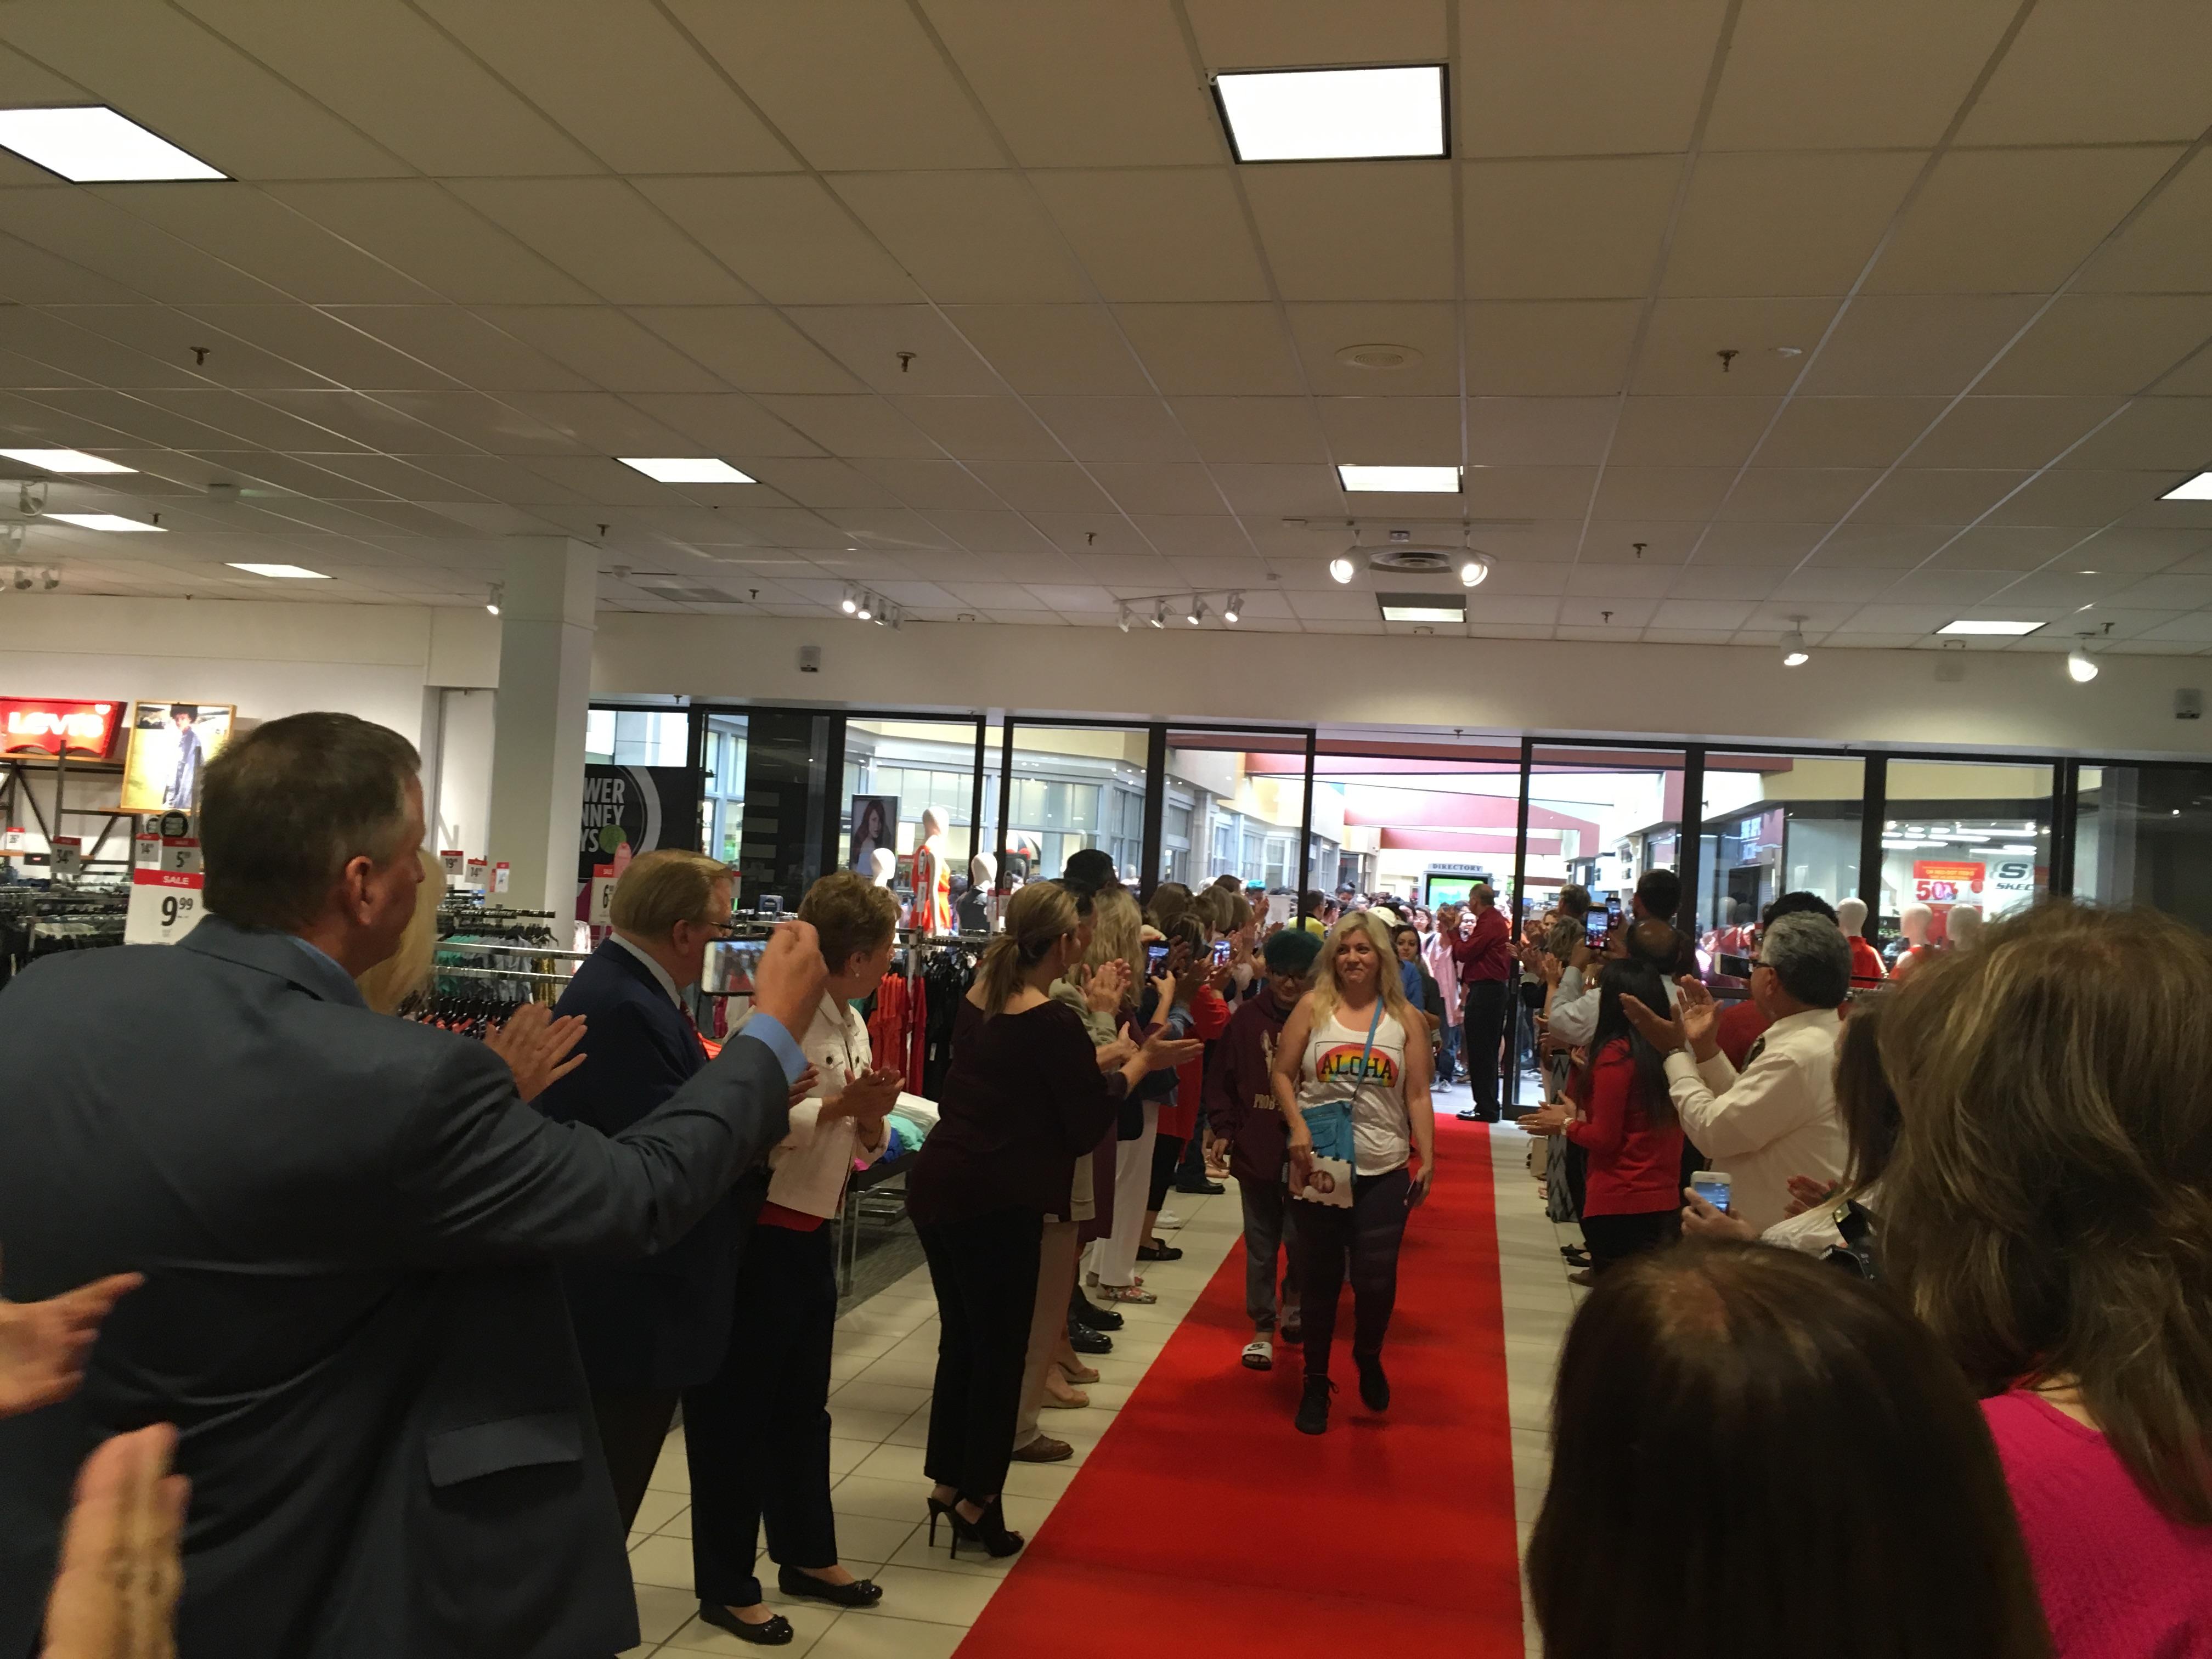 The first customer walks down the Sephora red carpet (LIVE!/Photo: Maura Ballard)